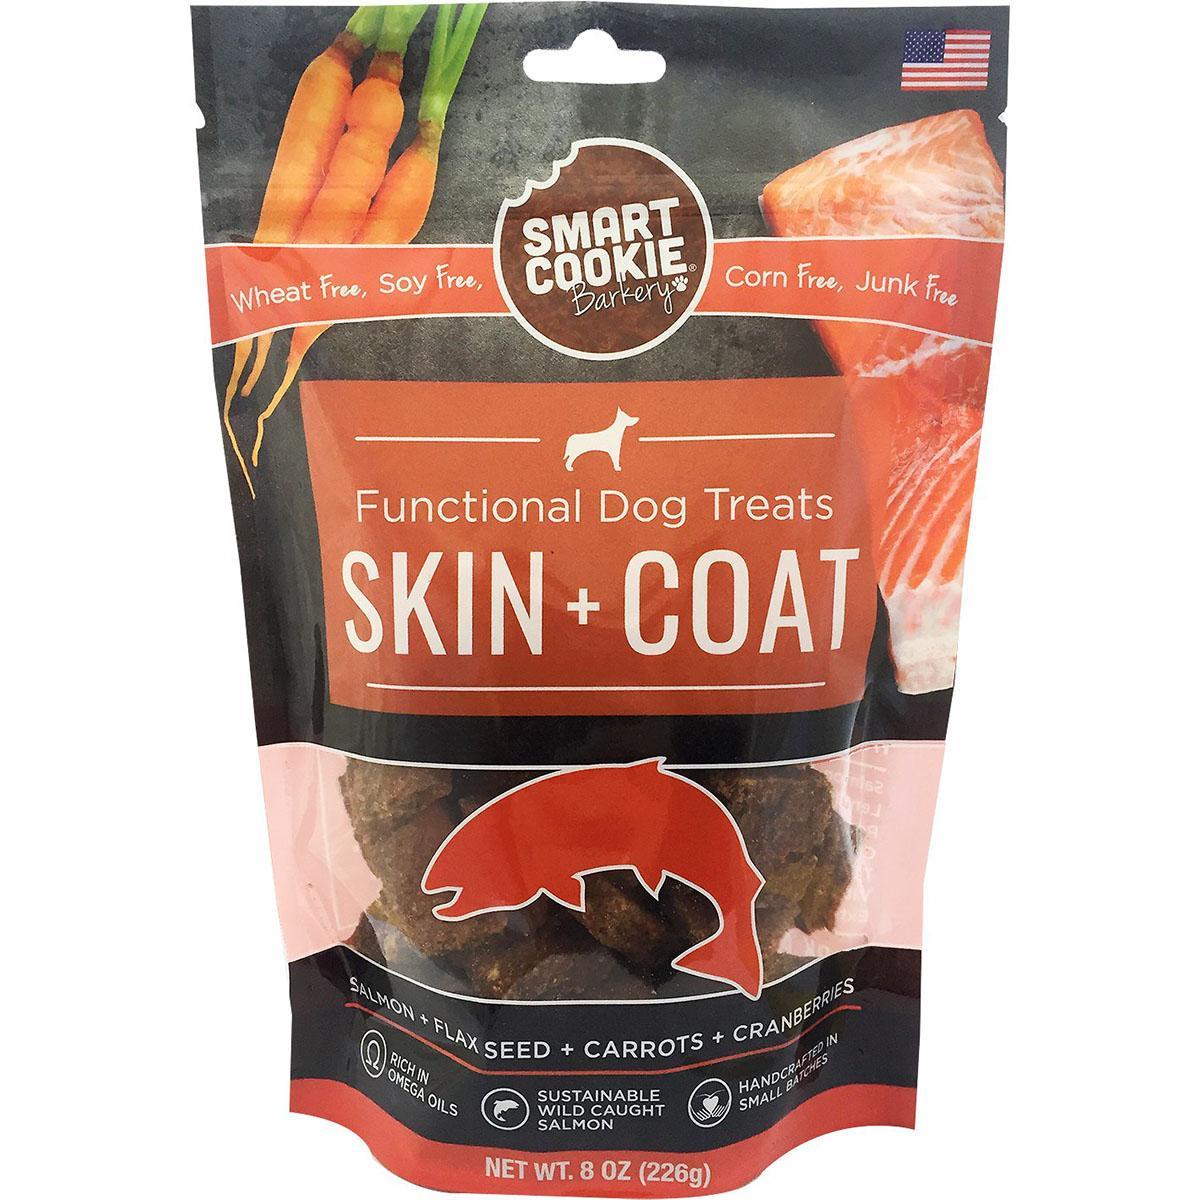 Smart Cookie Barkery Skin & Coat Salmon Dog Treats